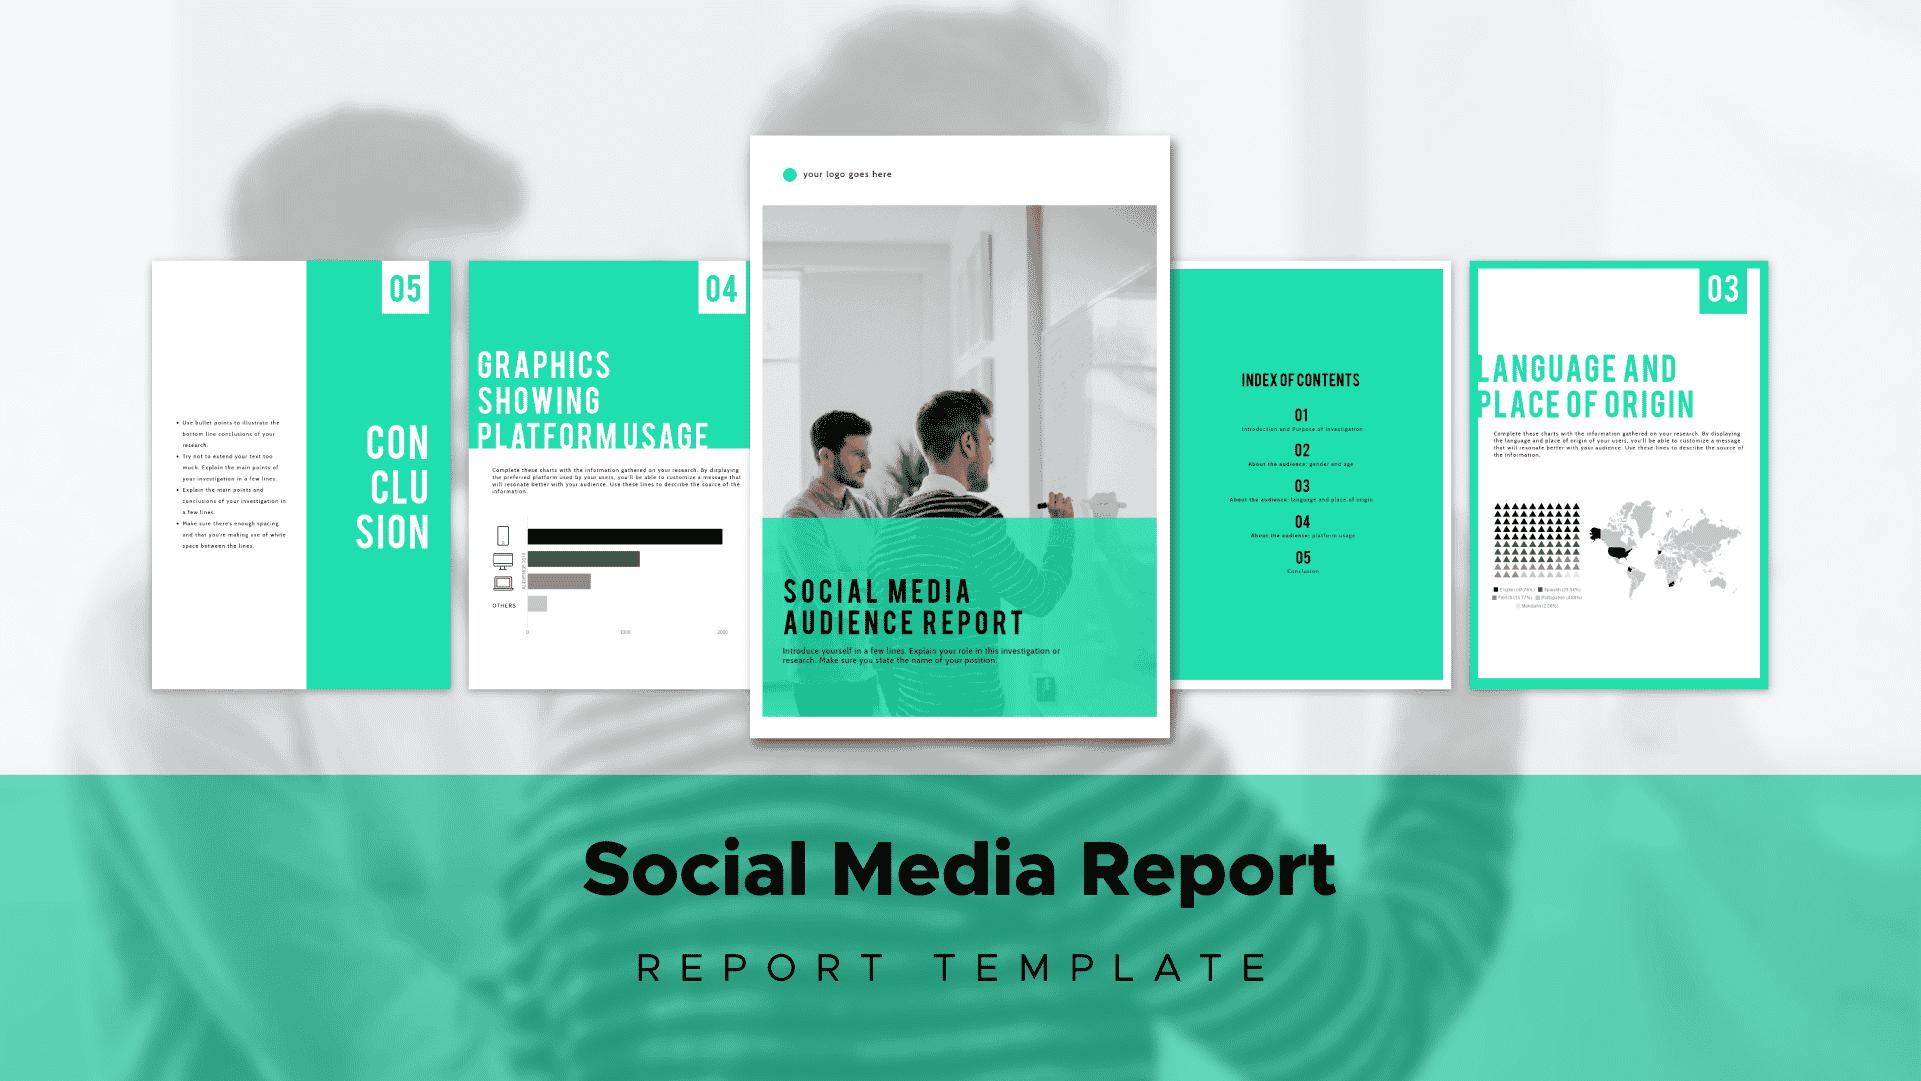 templates-visual_report_1141-1-7325047